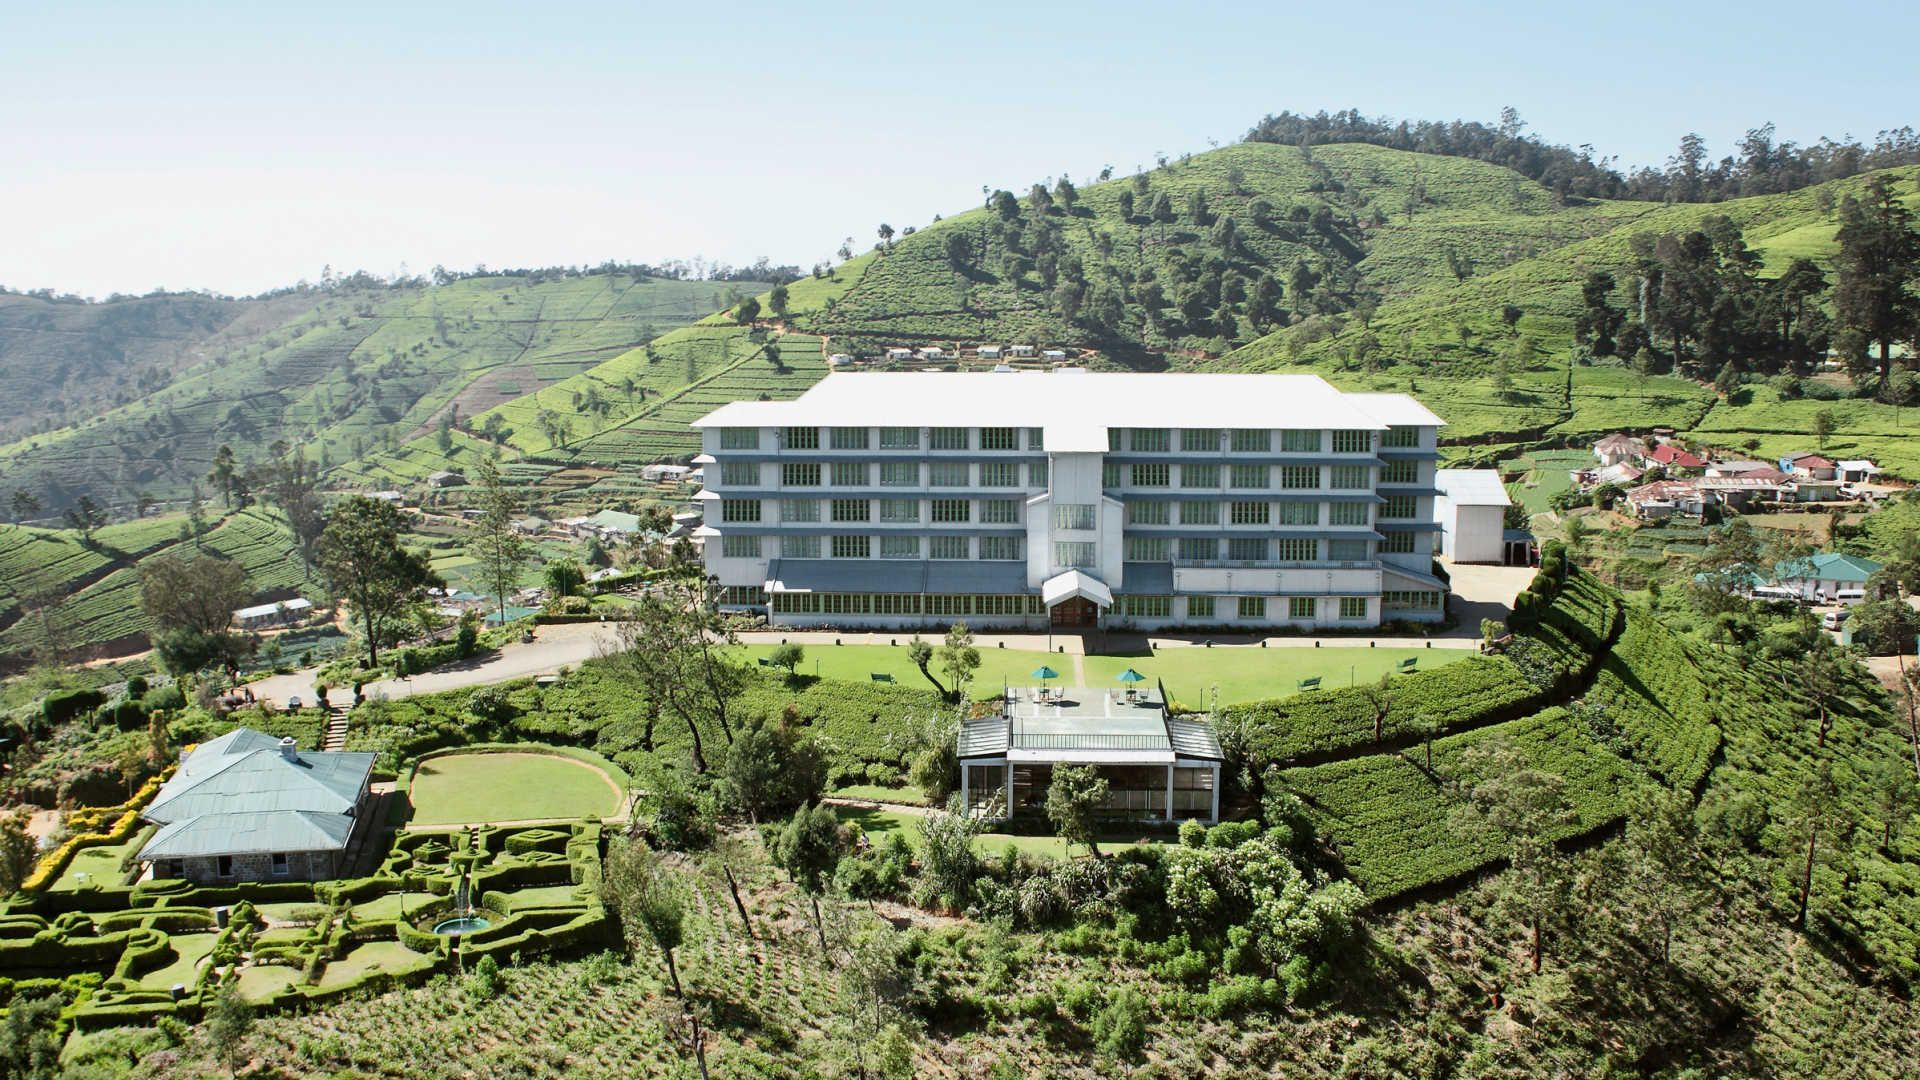 Afbeeldingsresultaat voor tea factory nuwara eliya